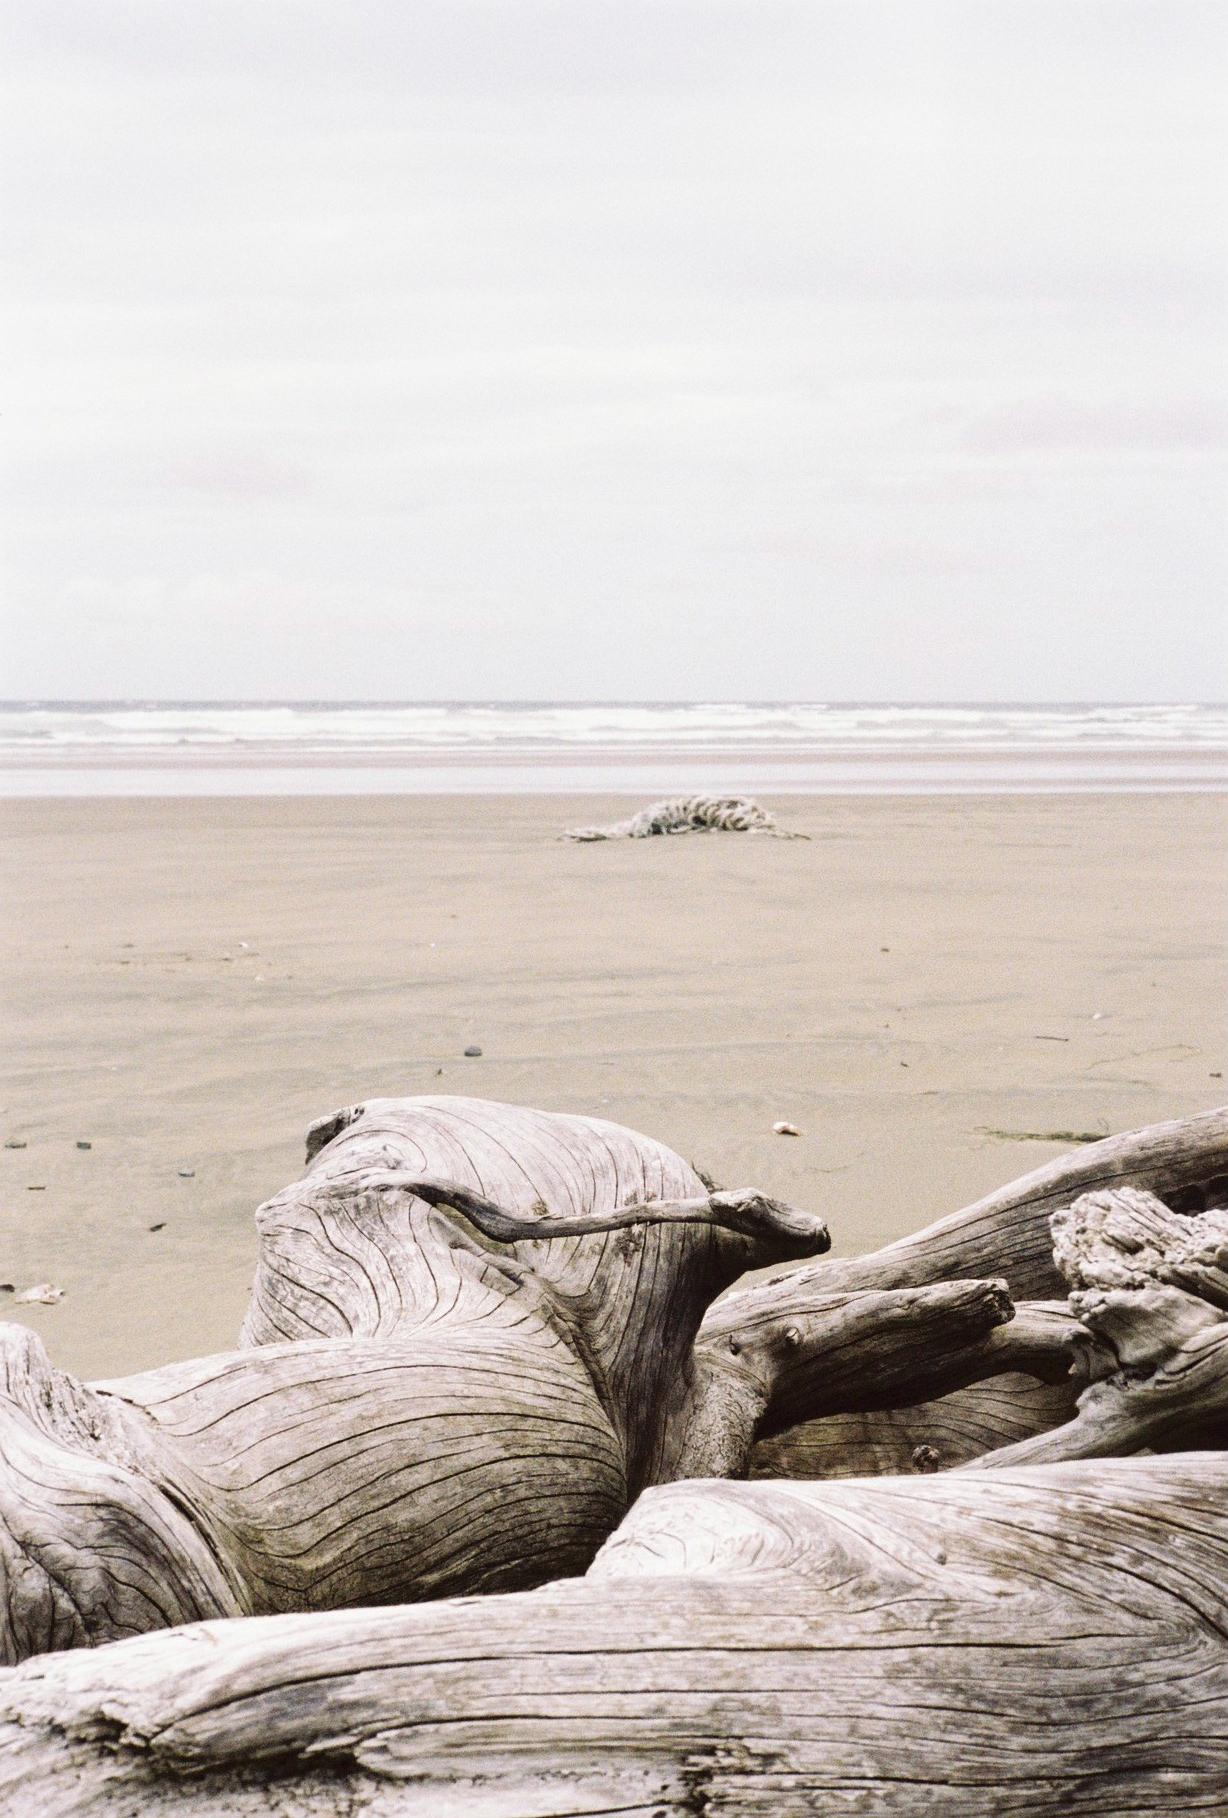 Beach log and rope.jpg